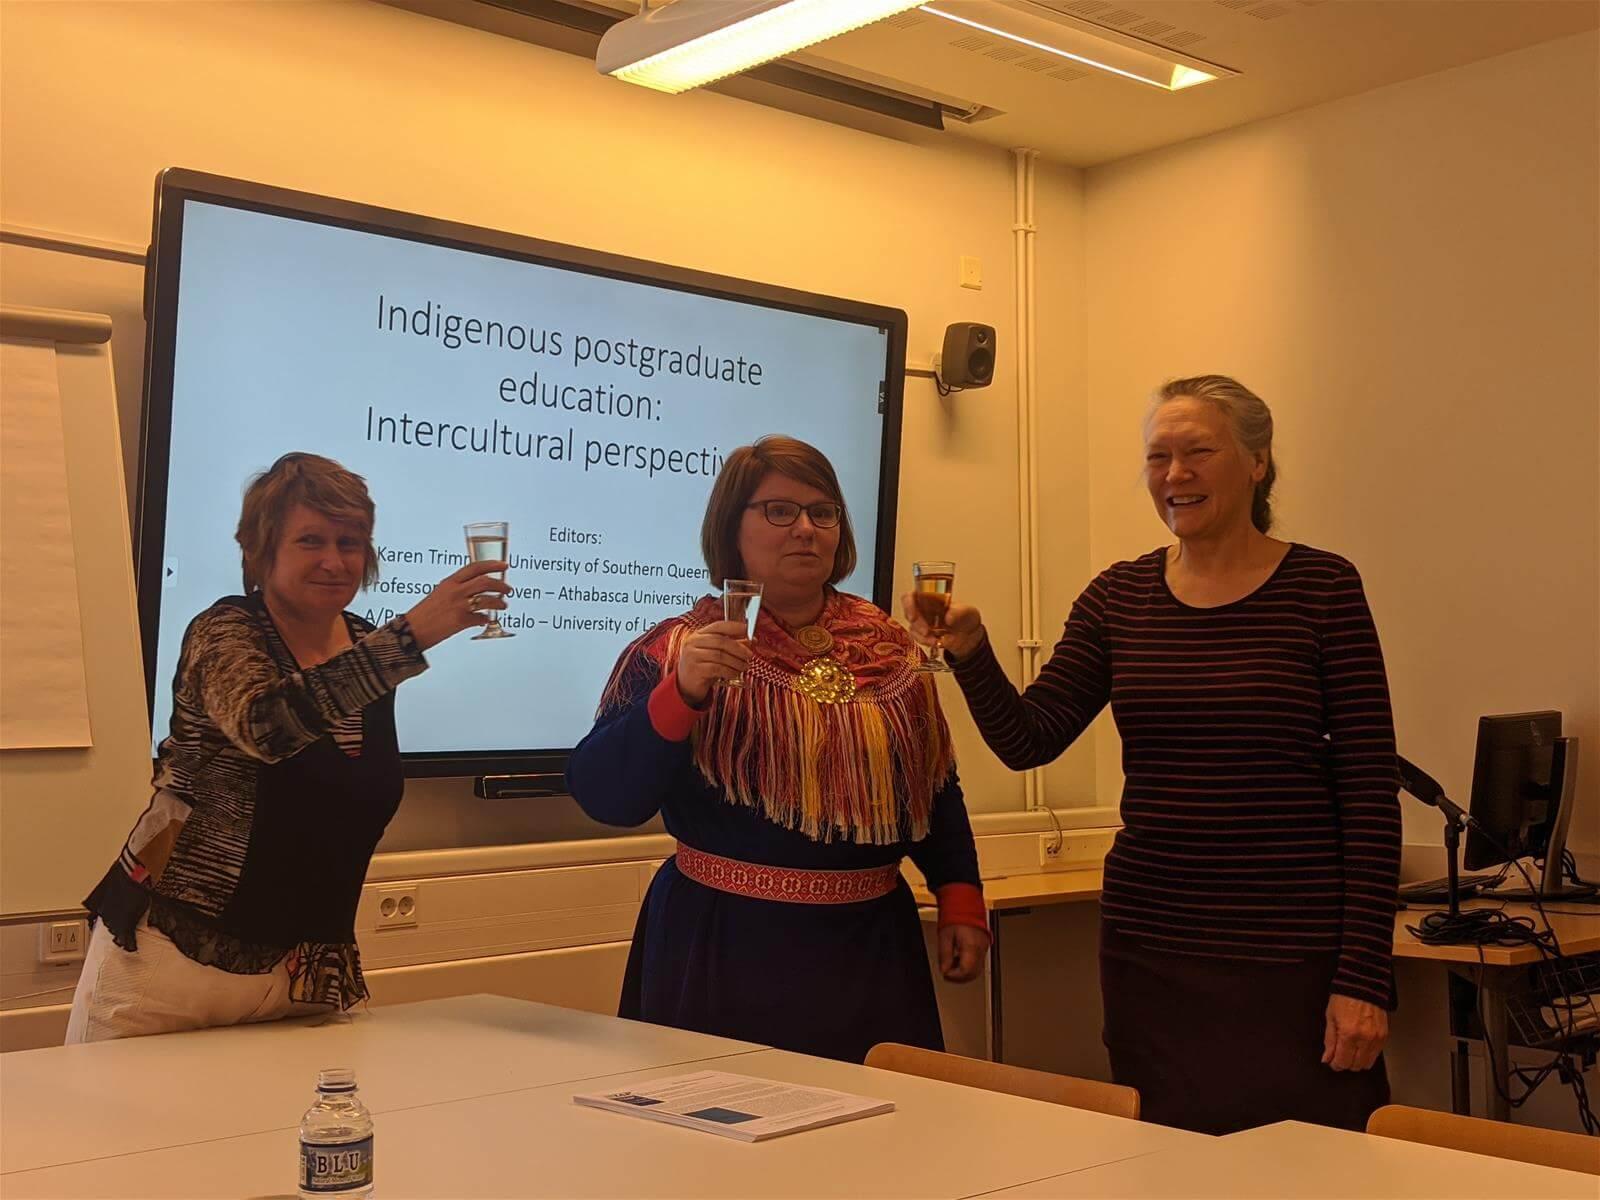 The editors Karen Trimmer, Pigga Keskitalo and Debra Hoven at the book launch.